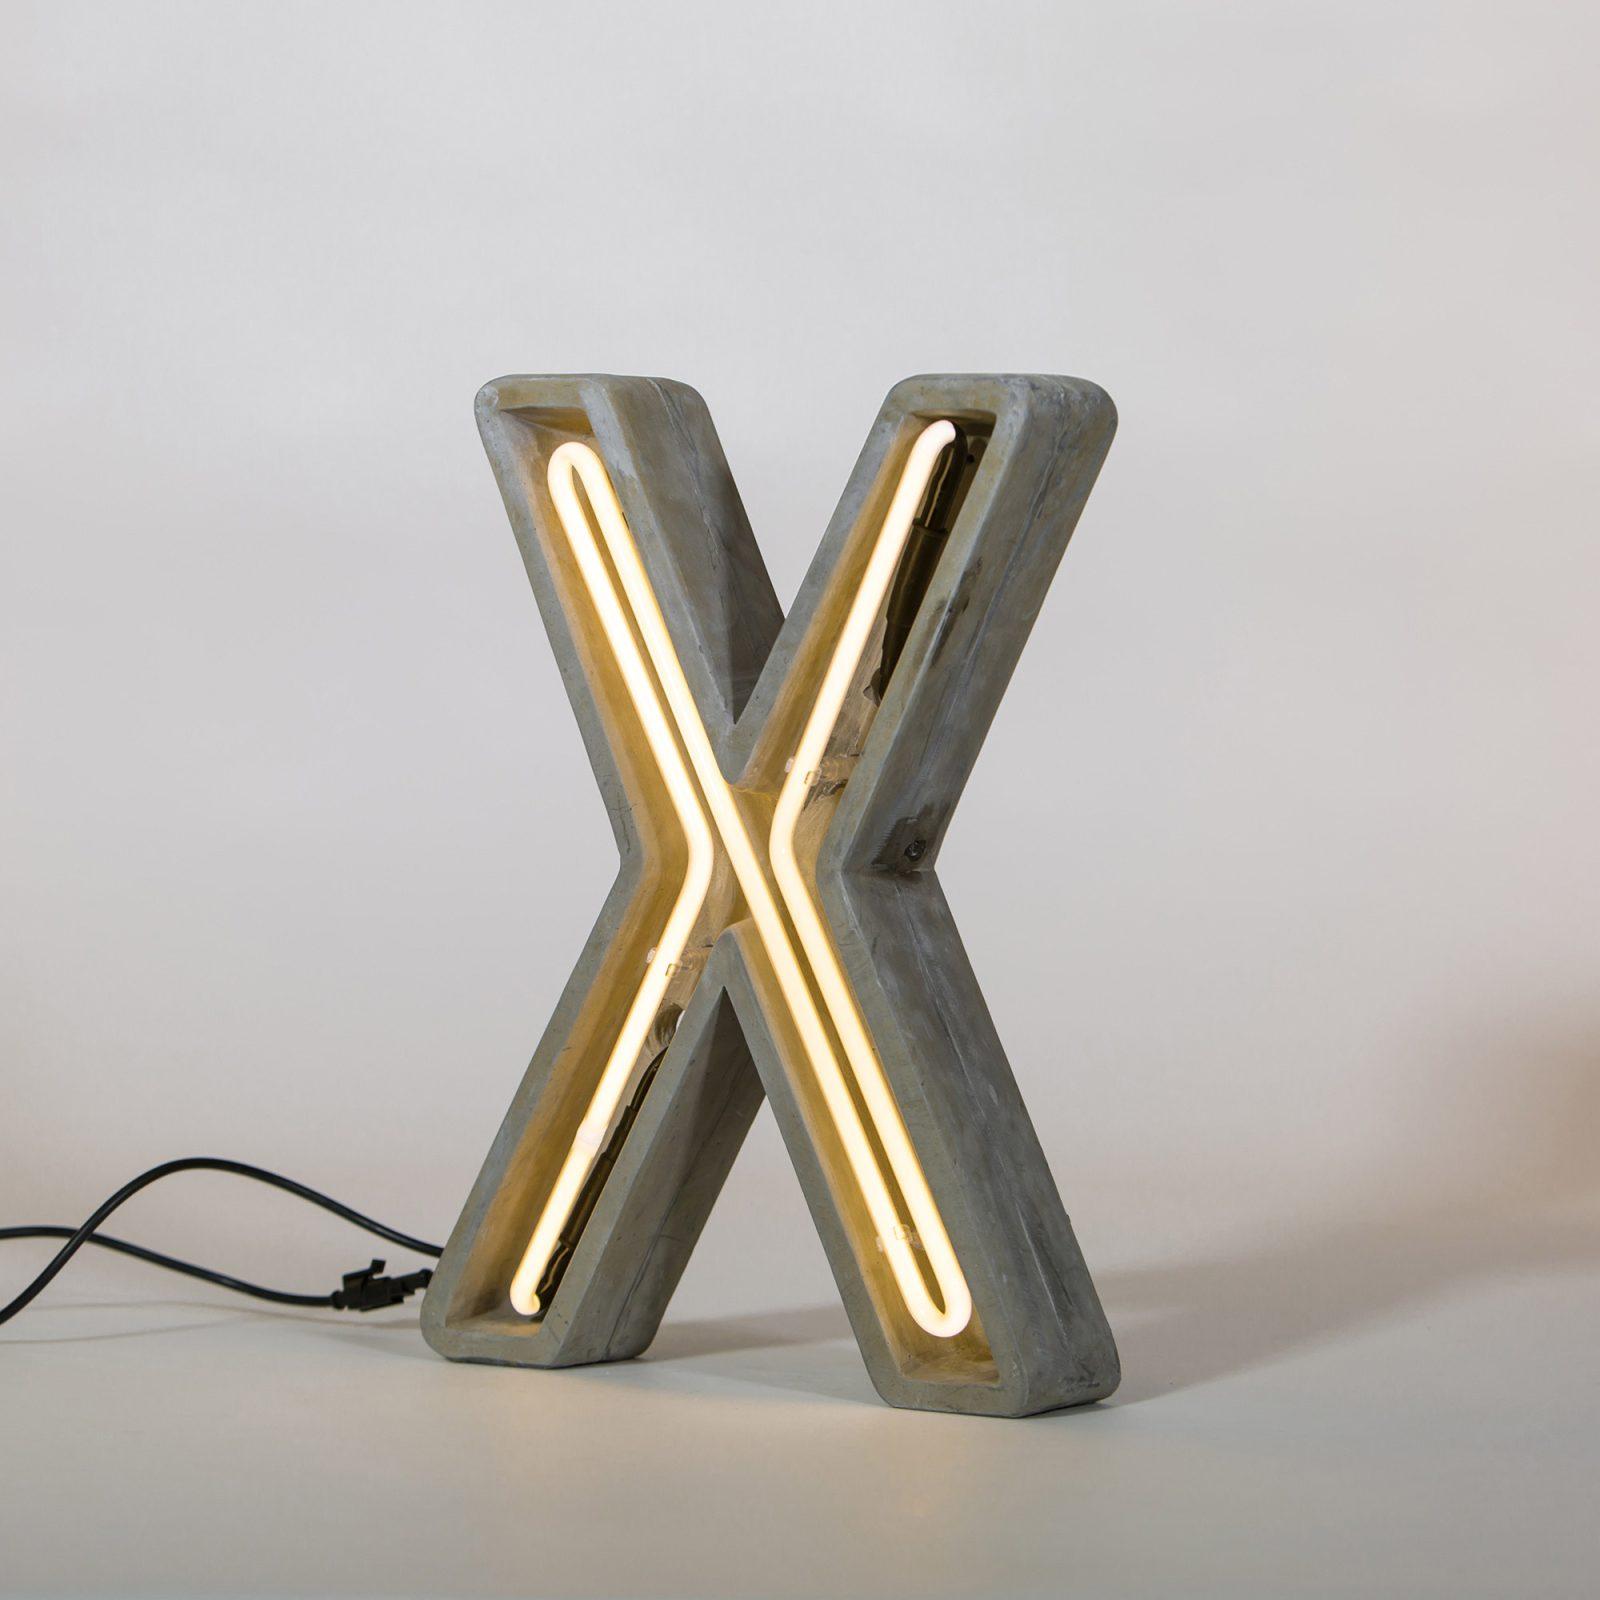 Alphacrete, Concrete Neon Light – X-32278